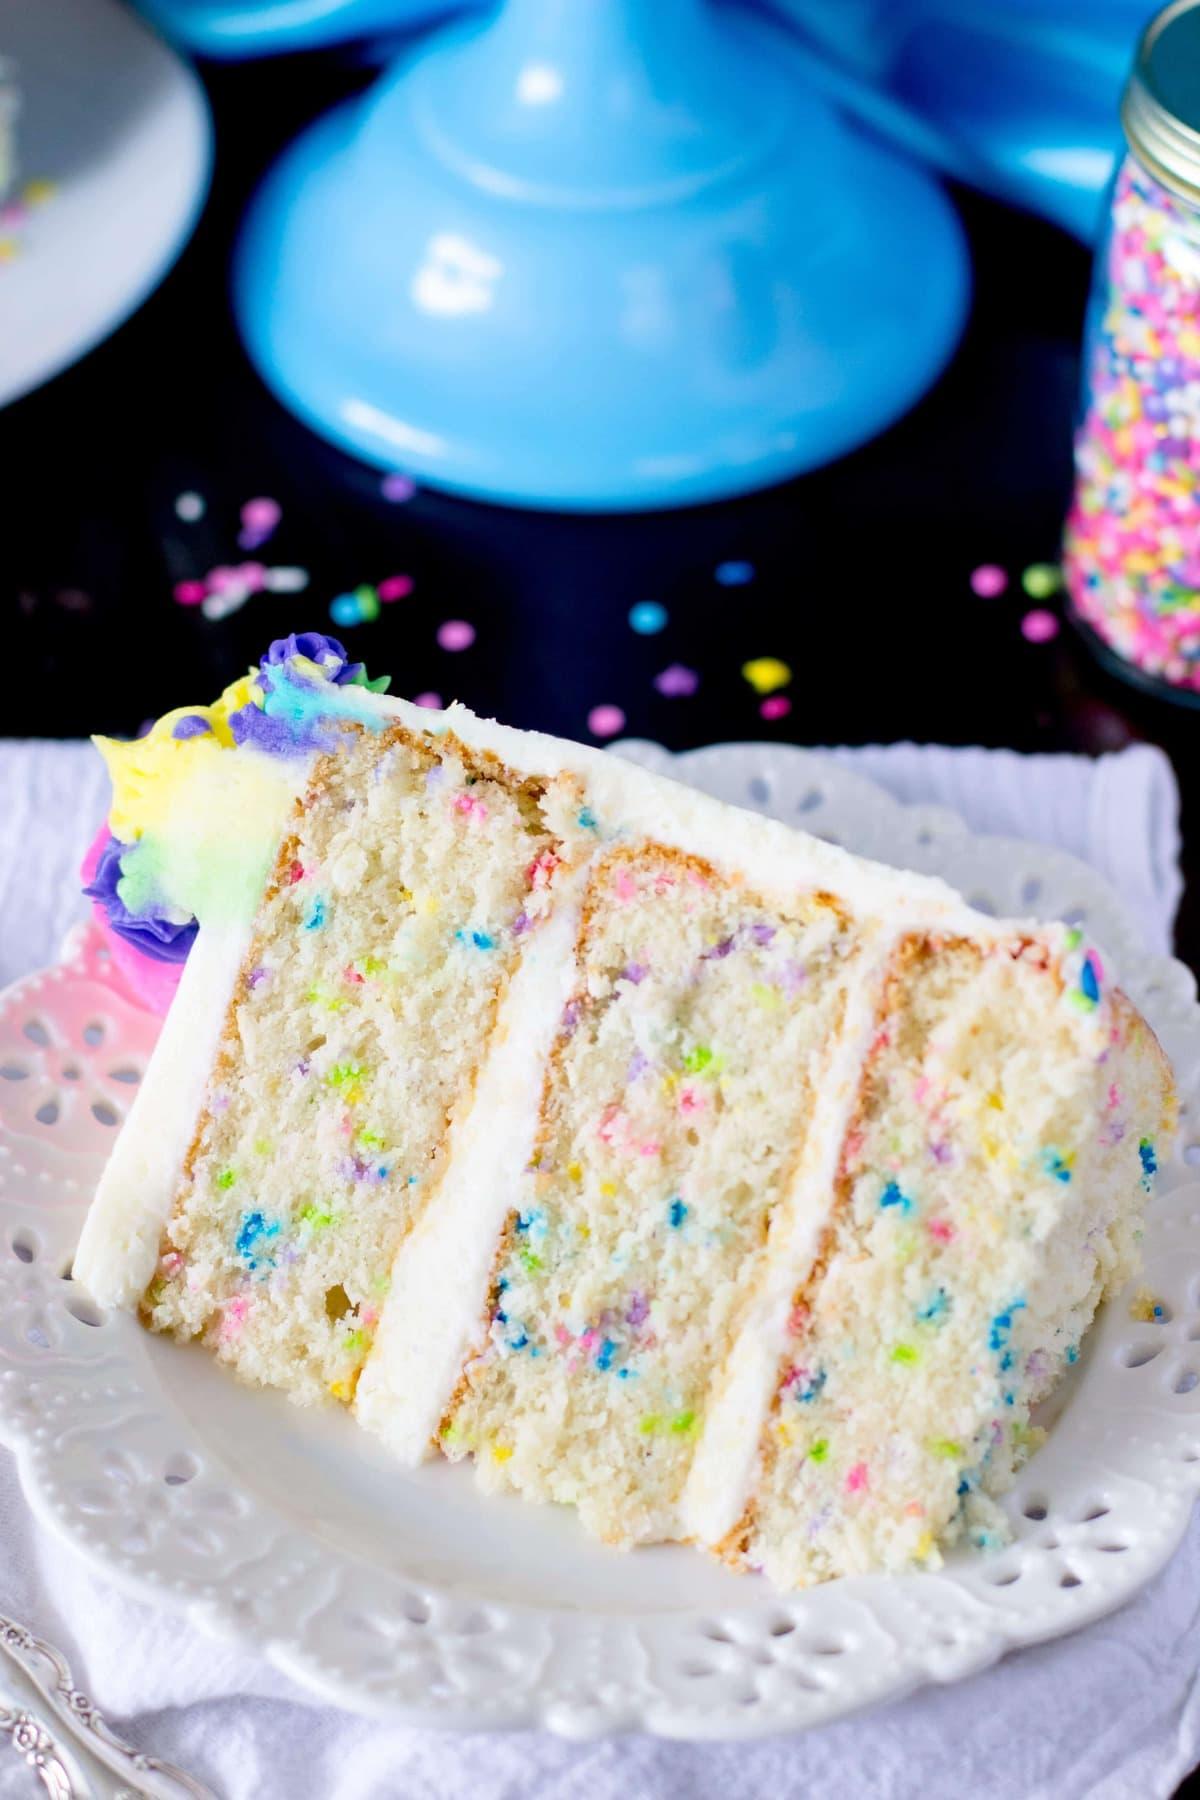 Funfetti Cake from Scratch (& A Very Merry Unbirthday) - Sugar ...